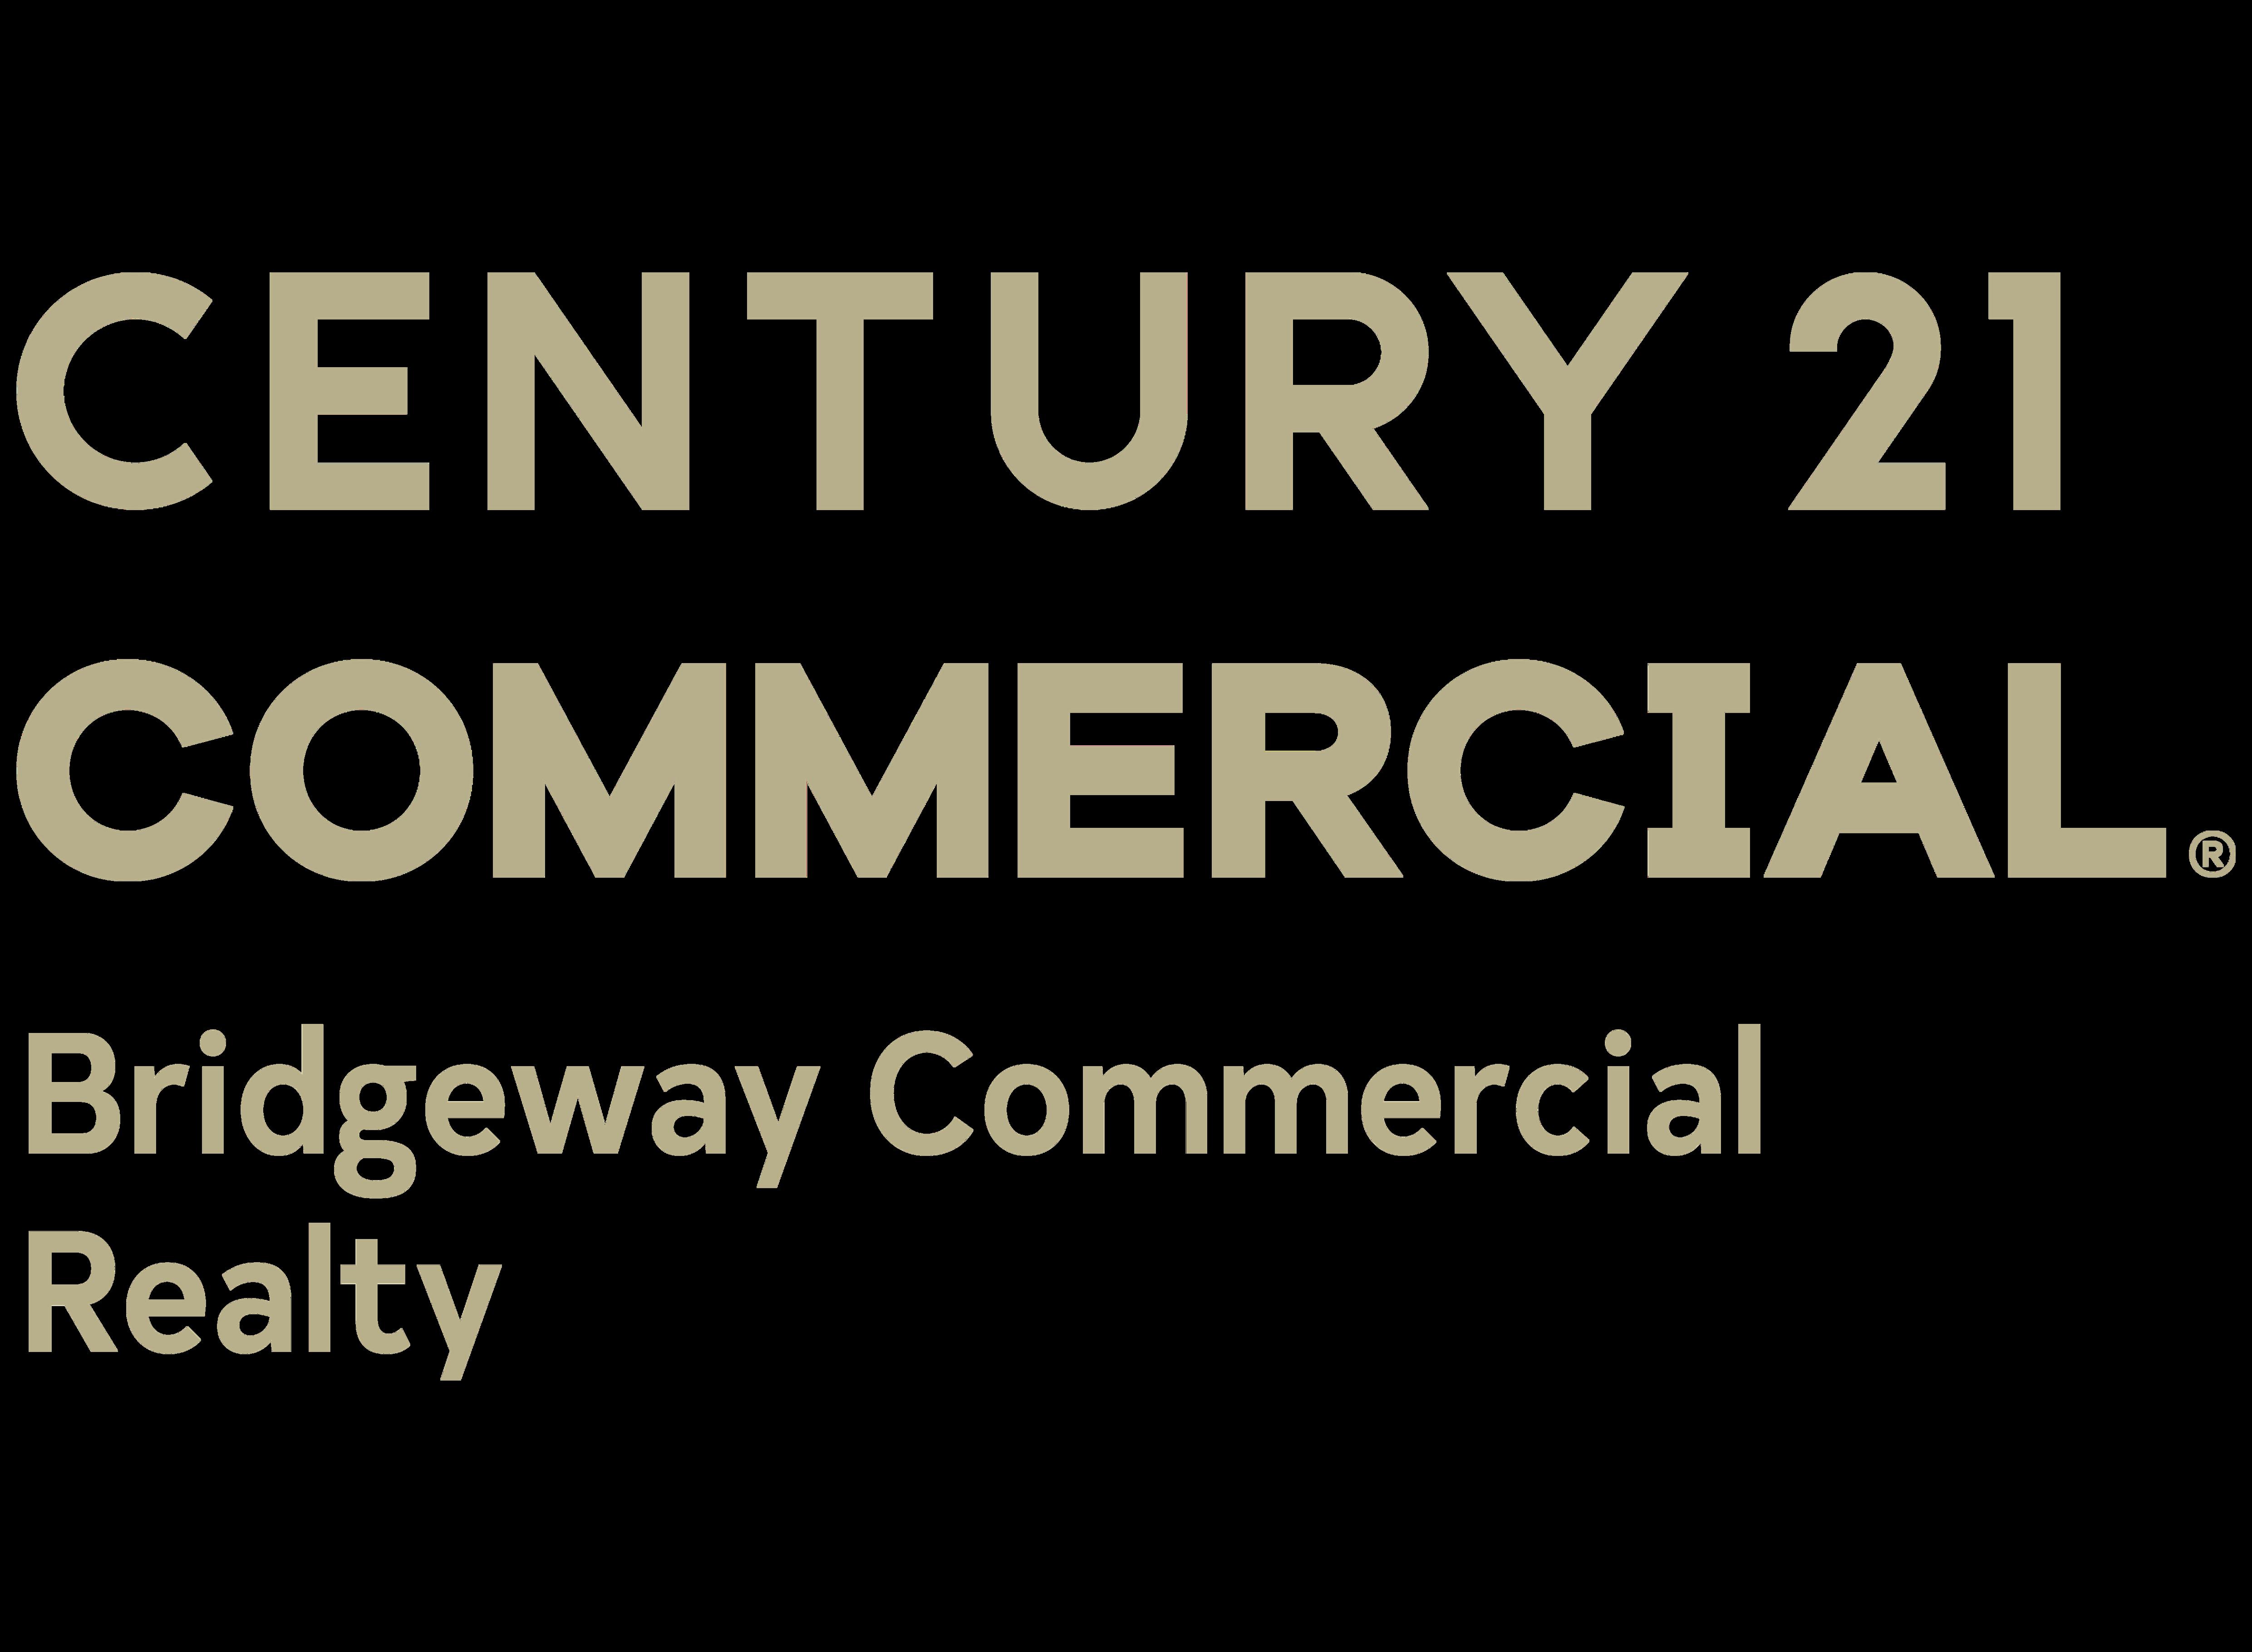 Thomas Lischak CCIM of CENTURY 21 Bridgeway Commercial Realty logo